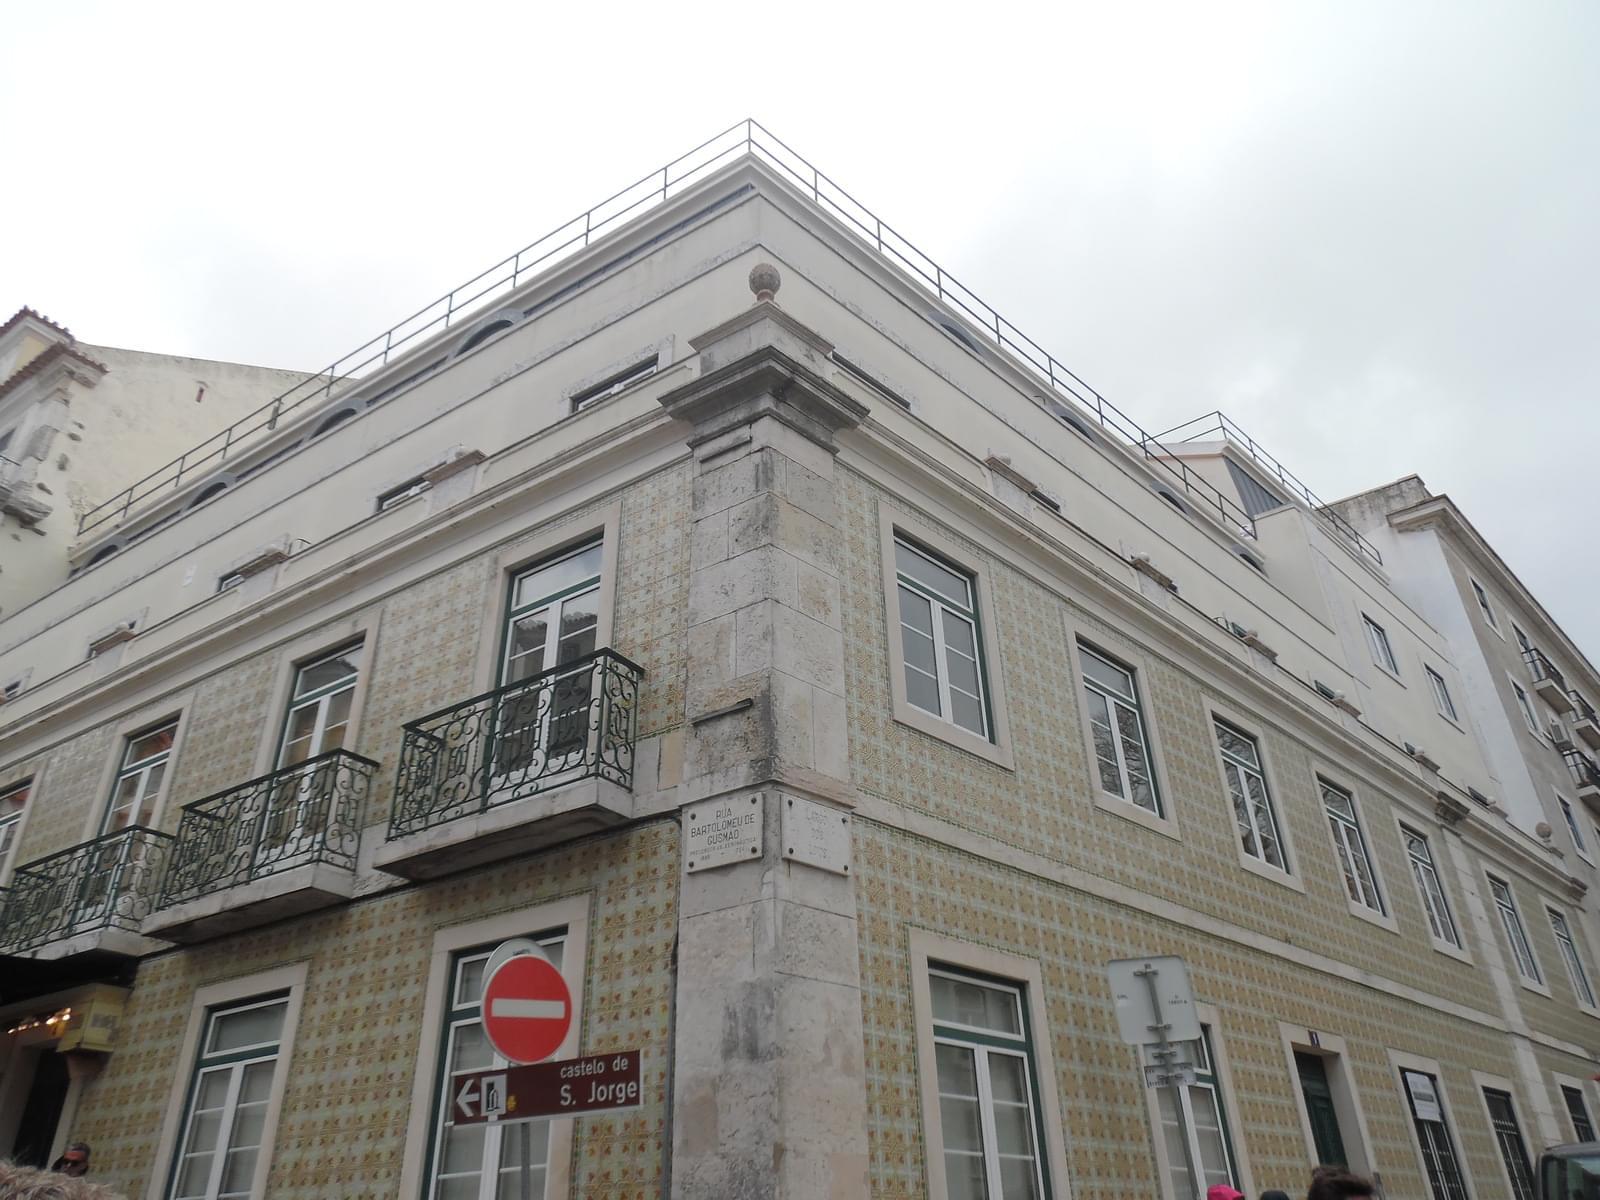 pf16905-apartamento-t1-lisboa-c873bdad-a4fb-45b0-a41e-77d59cb0ce50